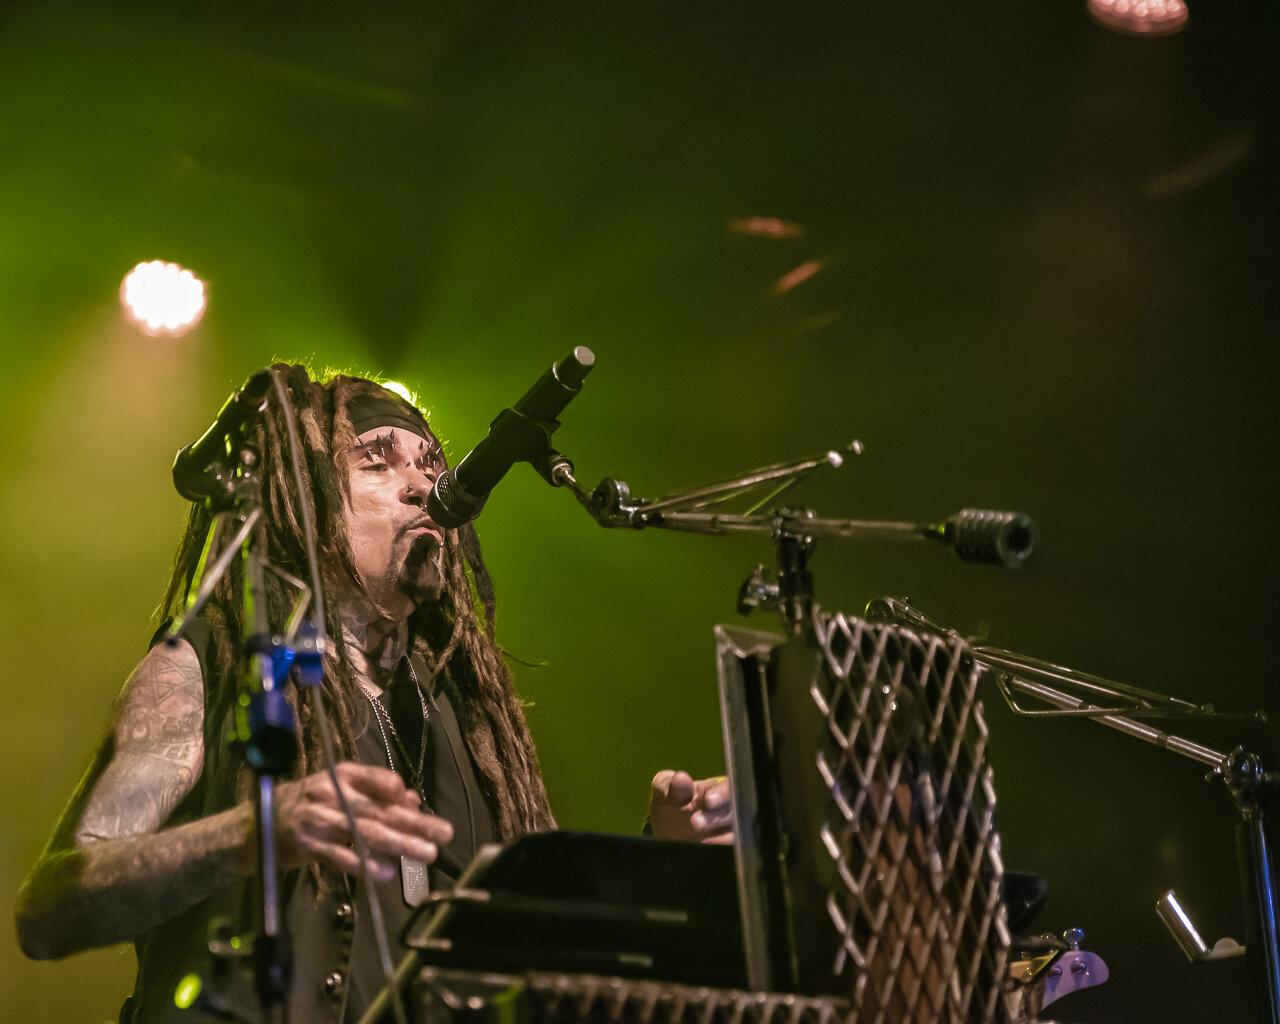 Ministry-VinylMusicHall-Pensacola-Nov012019-Raymer-002.jpg